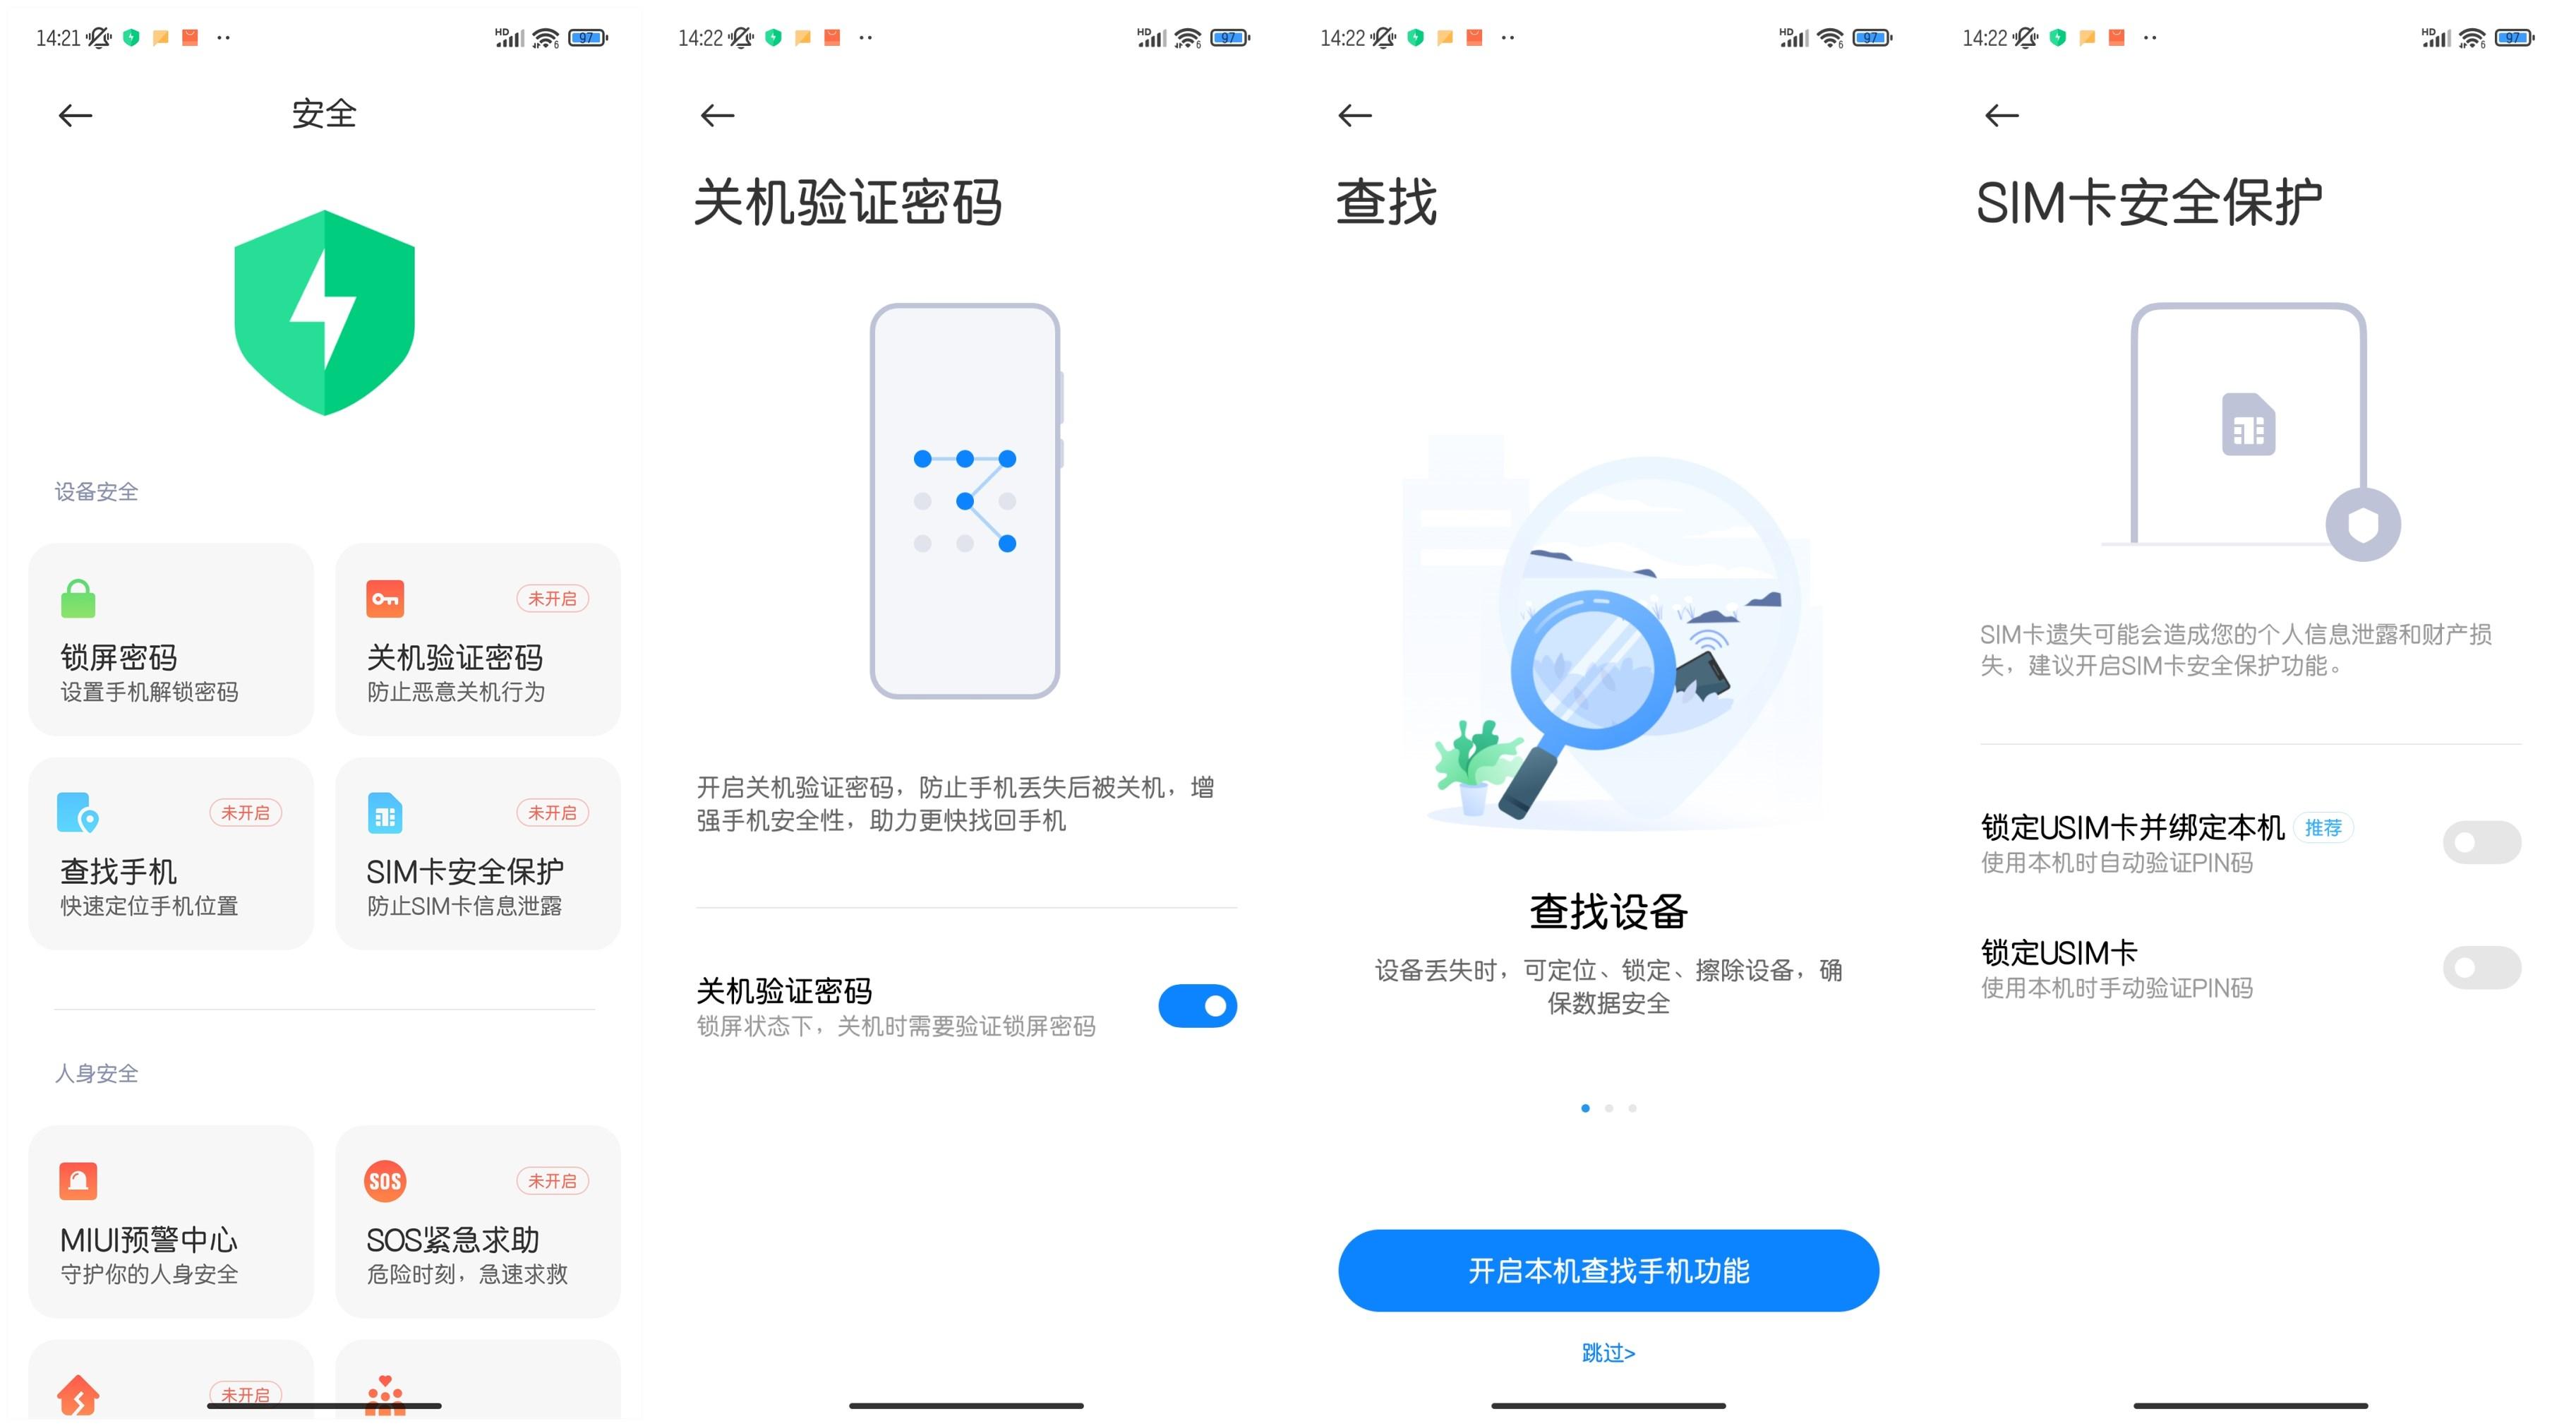 Screenshot_2021-08-13-14-21-52-307_com.miui.securitycenter_副本.jpg